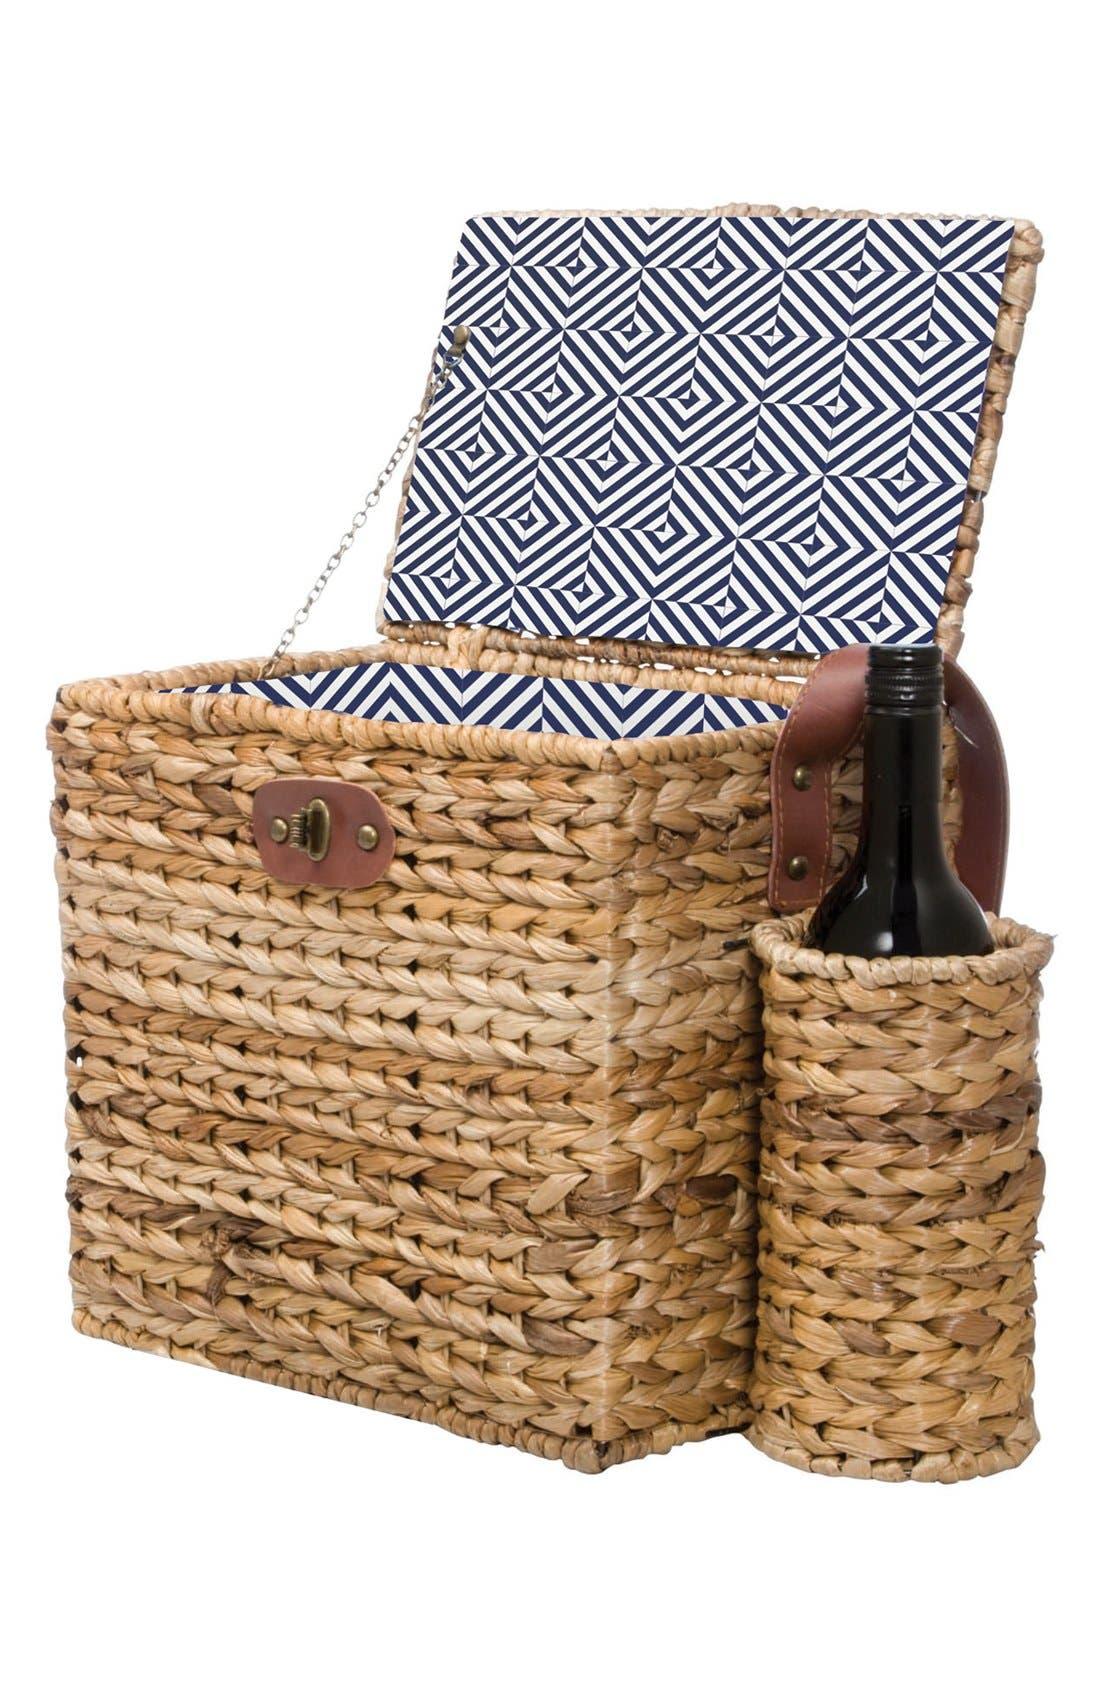 Main Image - Sunnylife Wicker Picnic Basket